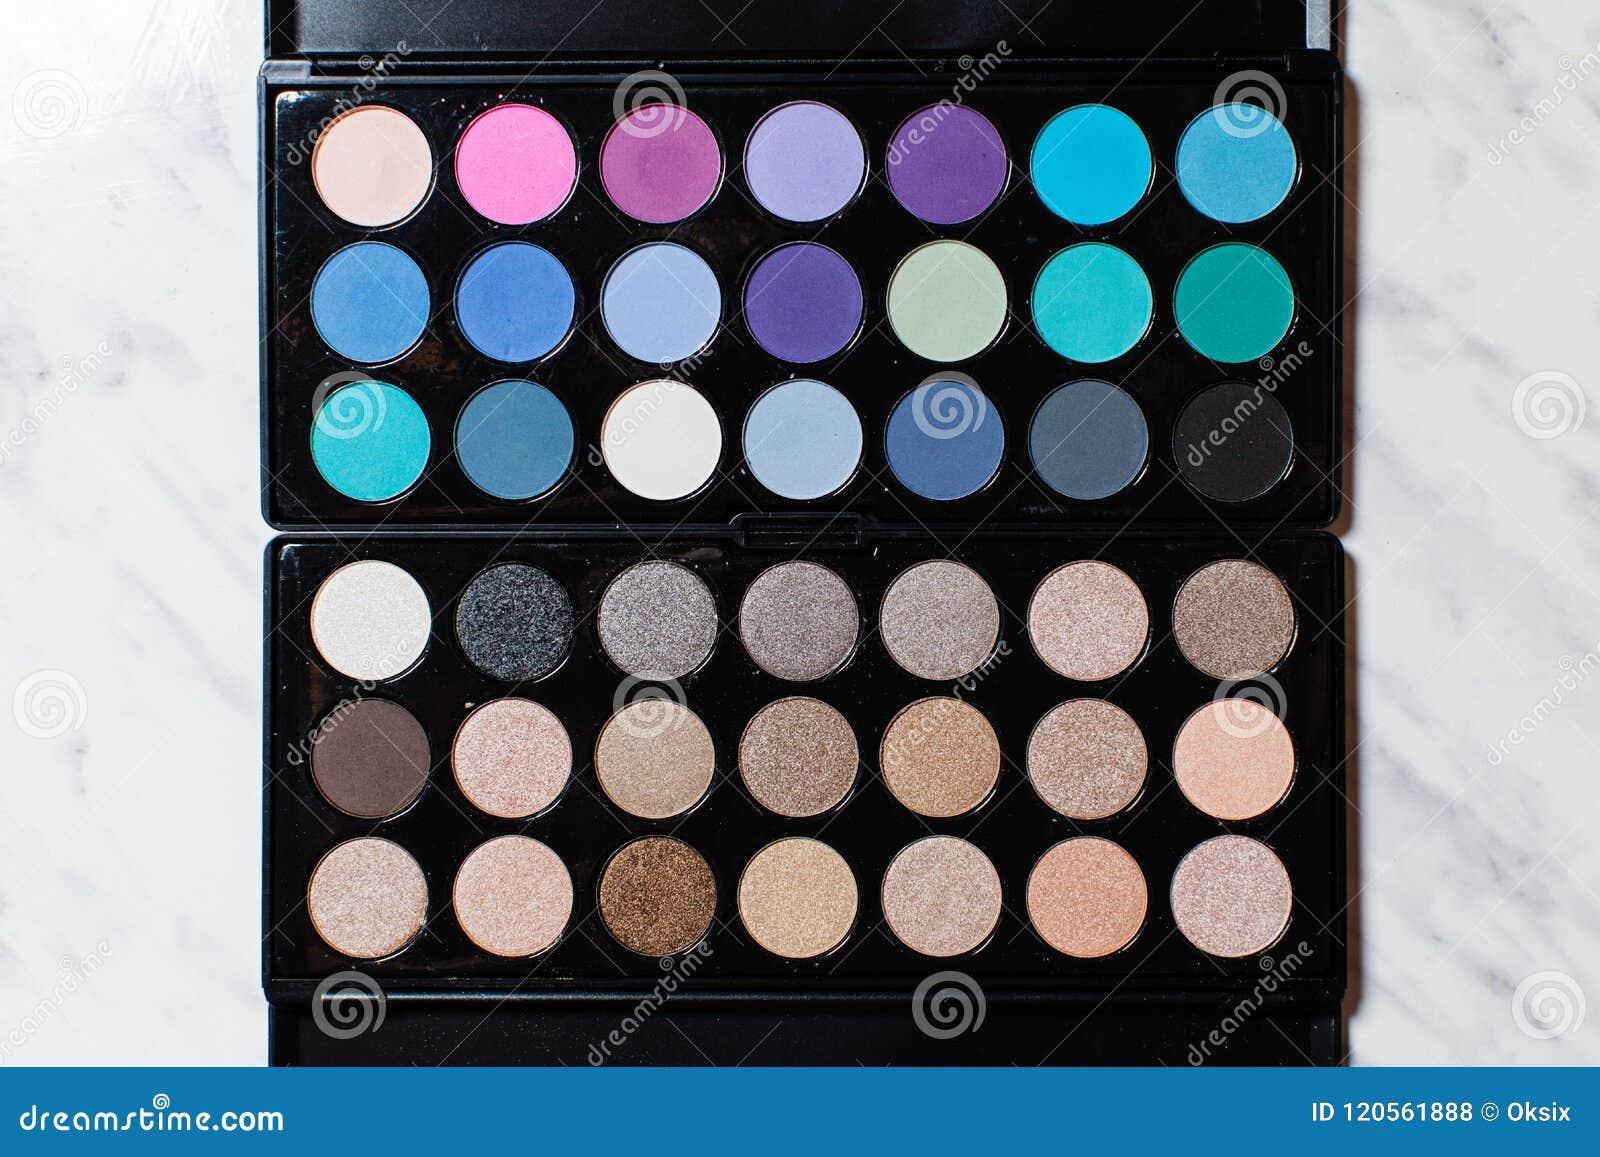 Big Of Choice For Stylish Makeup Stock Photo Image Of